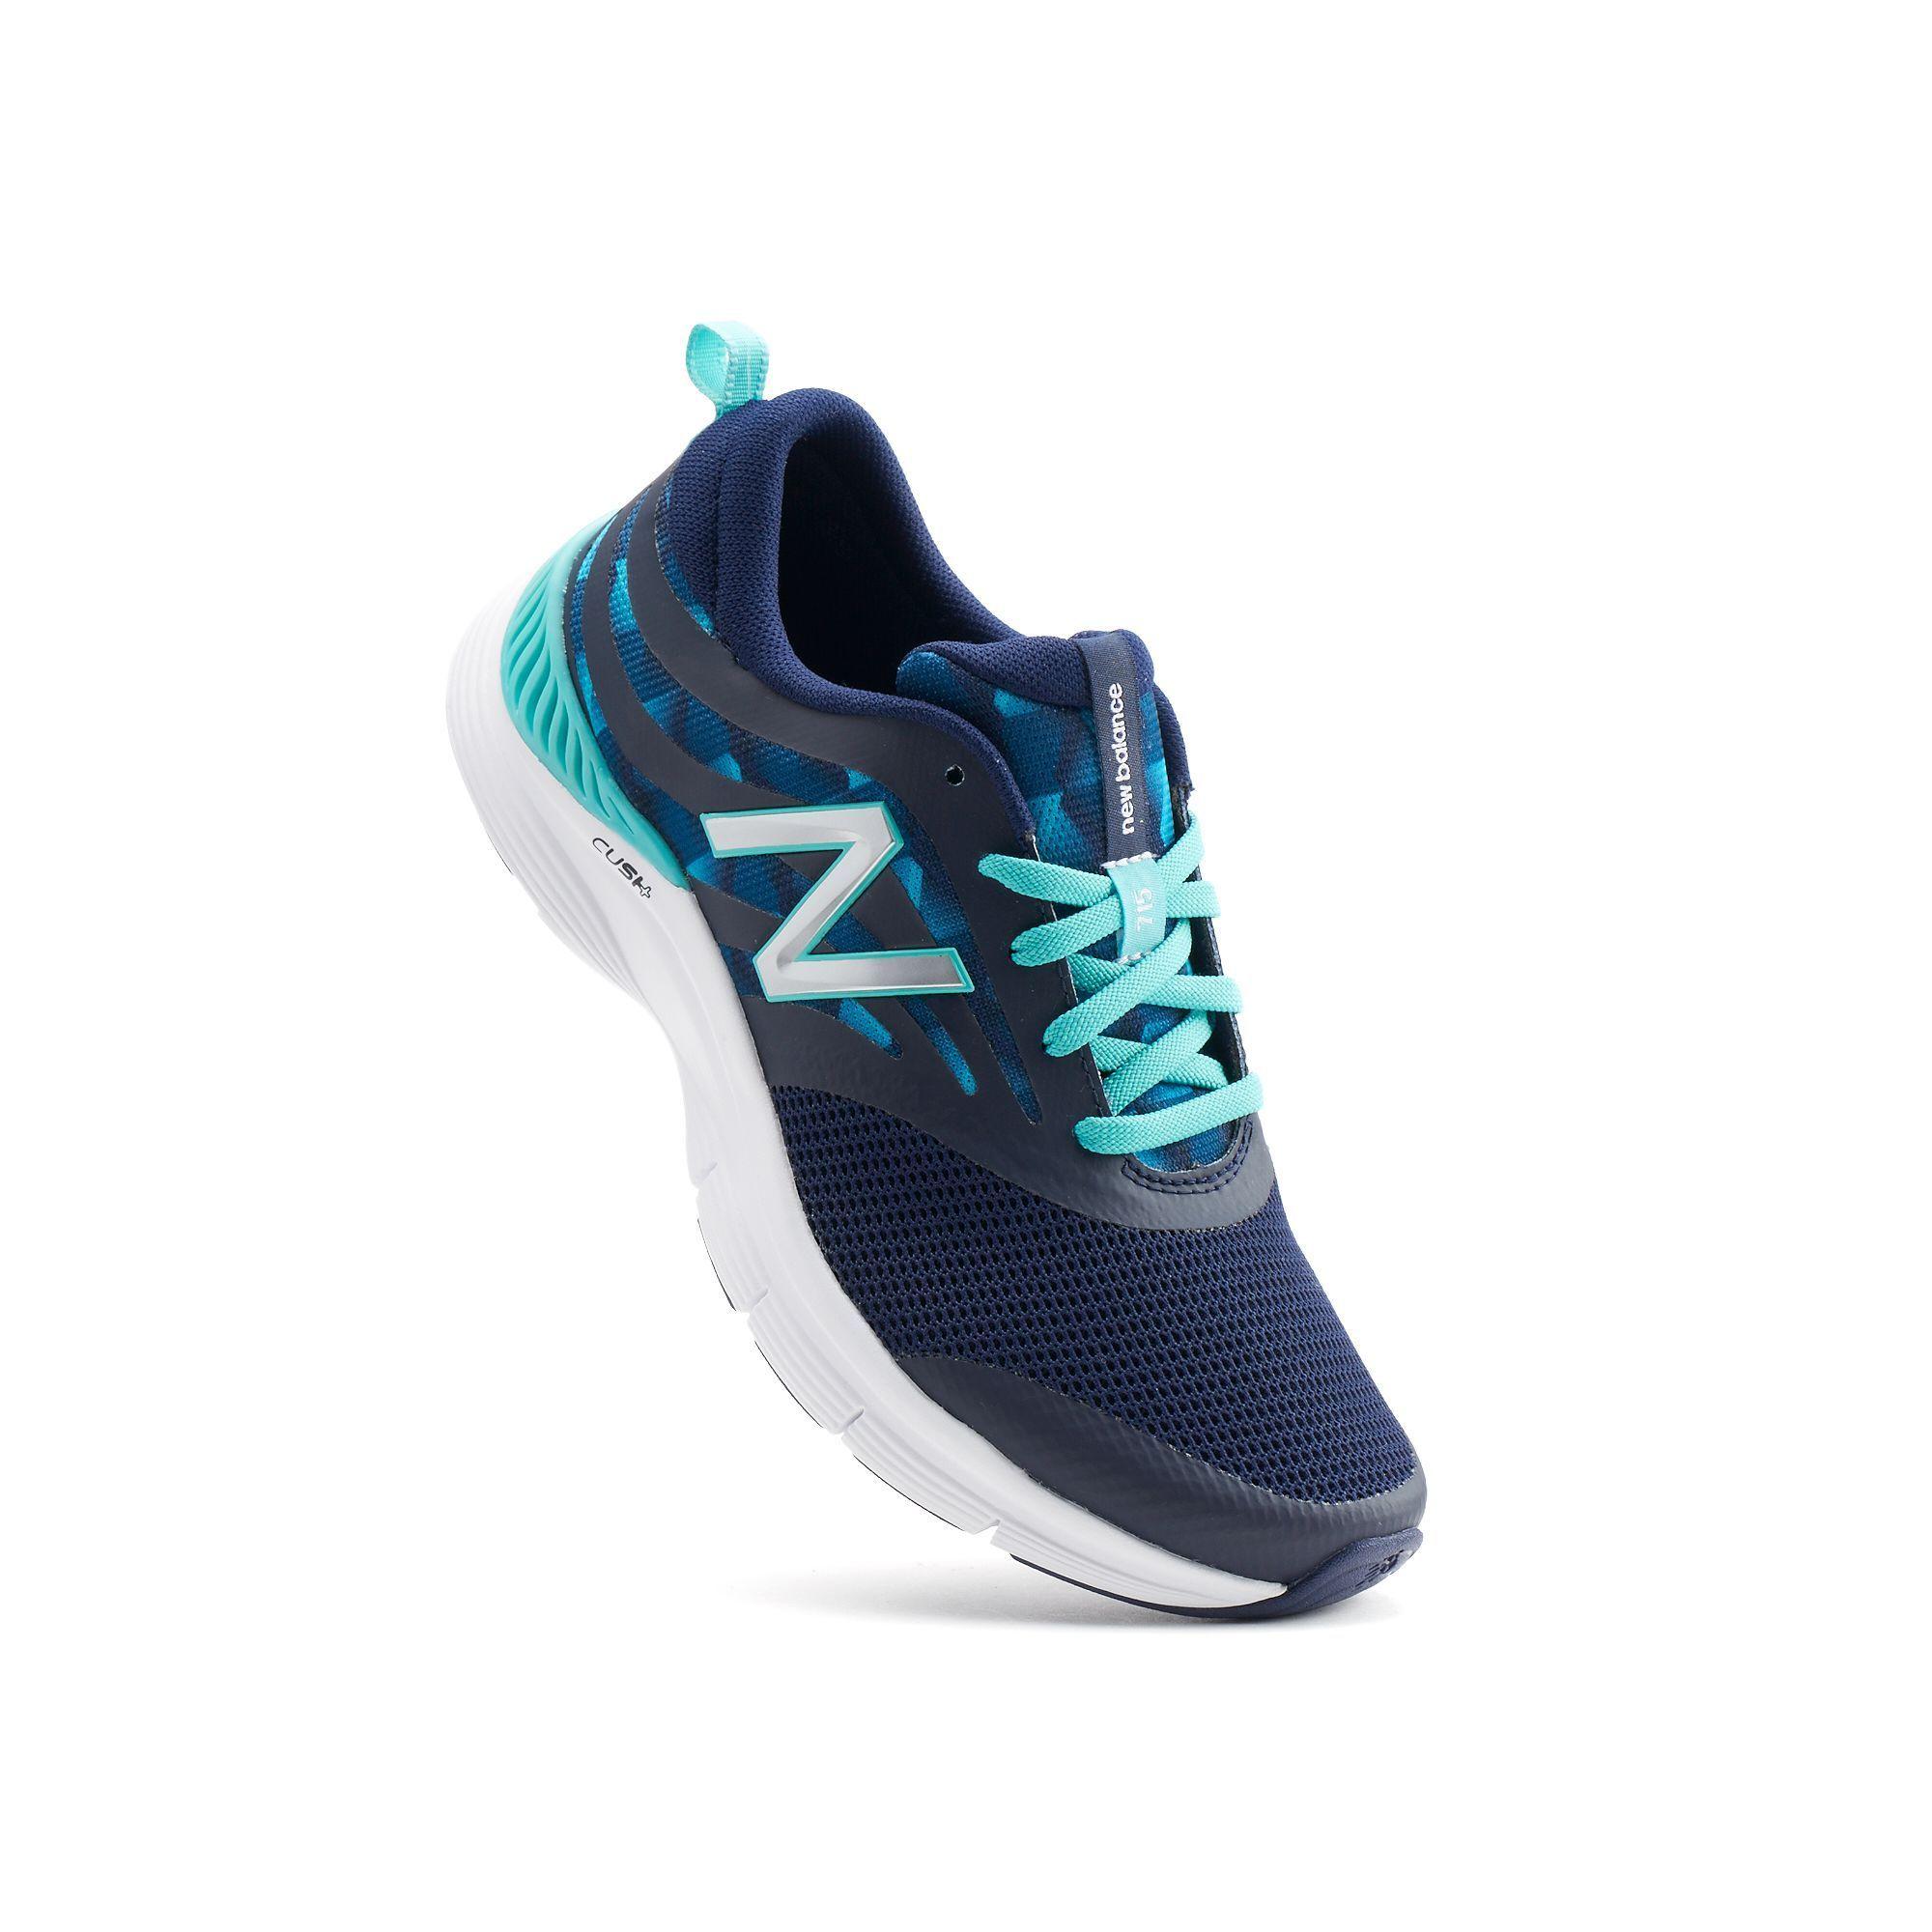 New Balance 715 Cush+ Women's Cross-Training Shoes, Size: 7.5 Wide, Blue